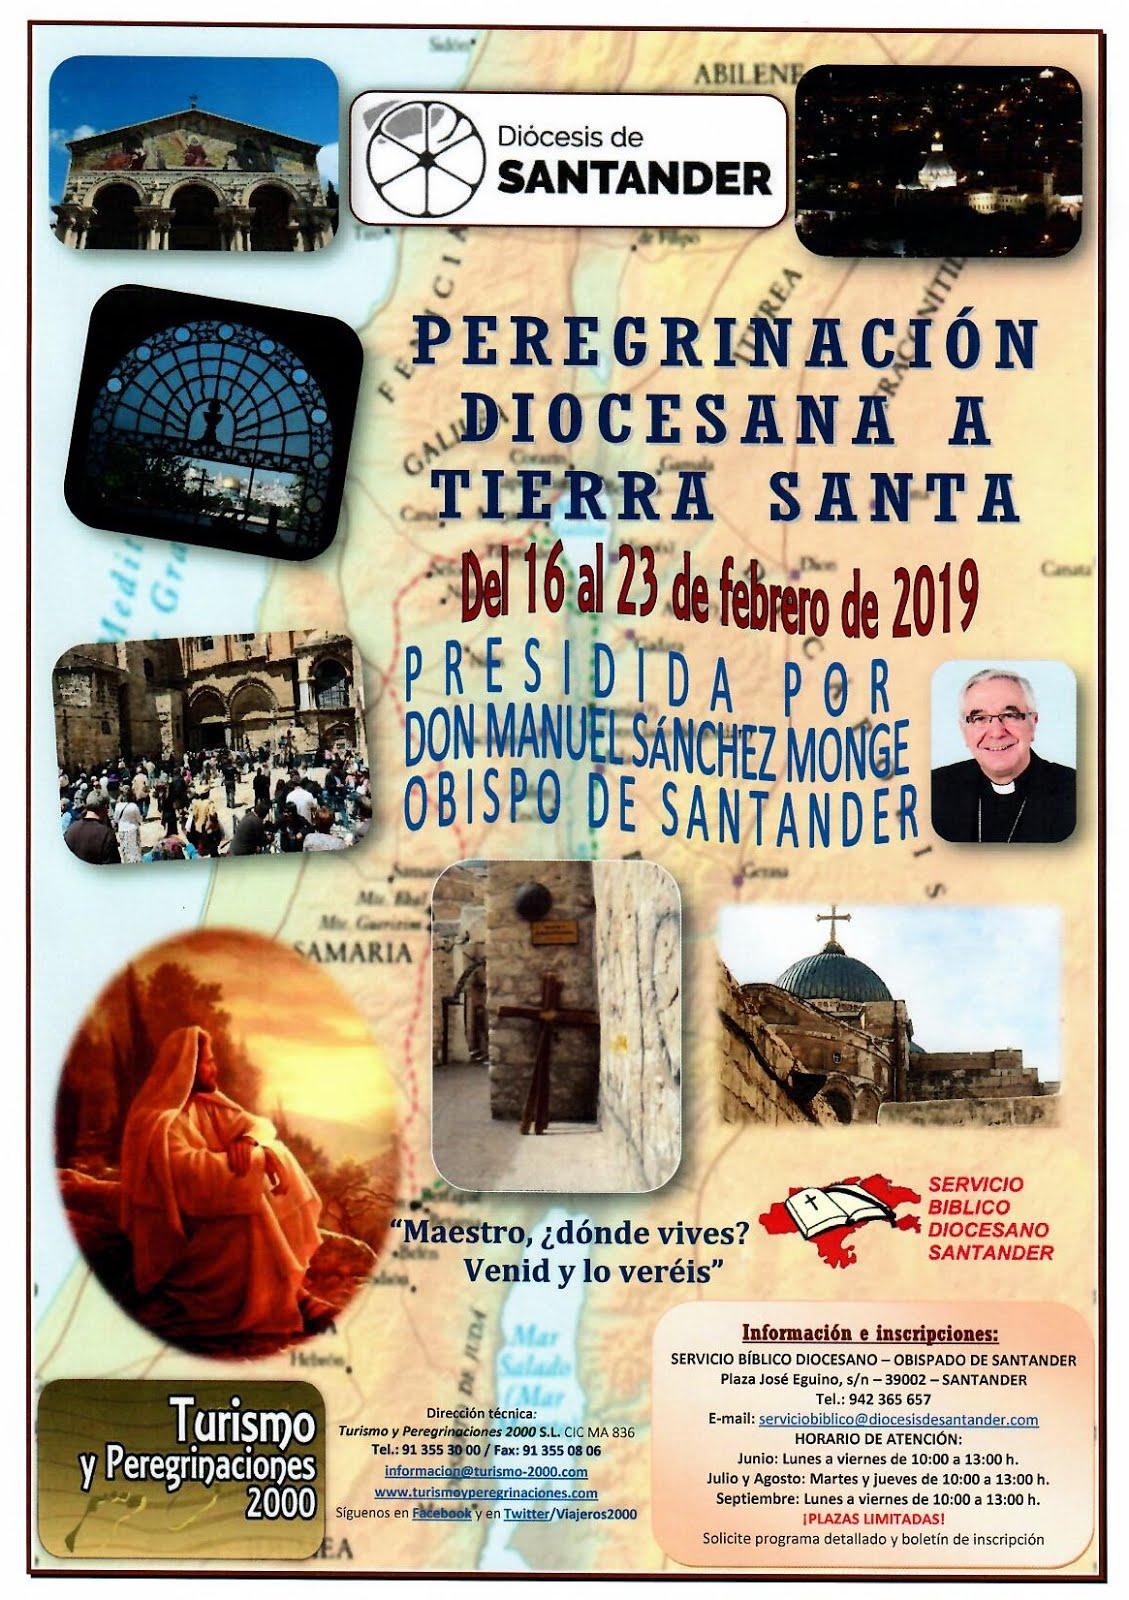 PEREGRINACION DIOCESANA A TIERRA SANTA